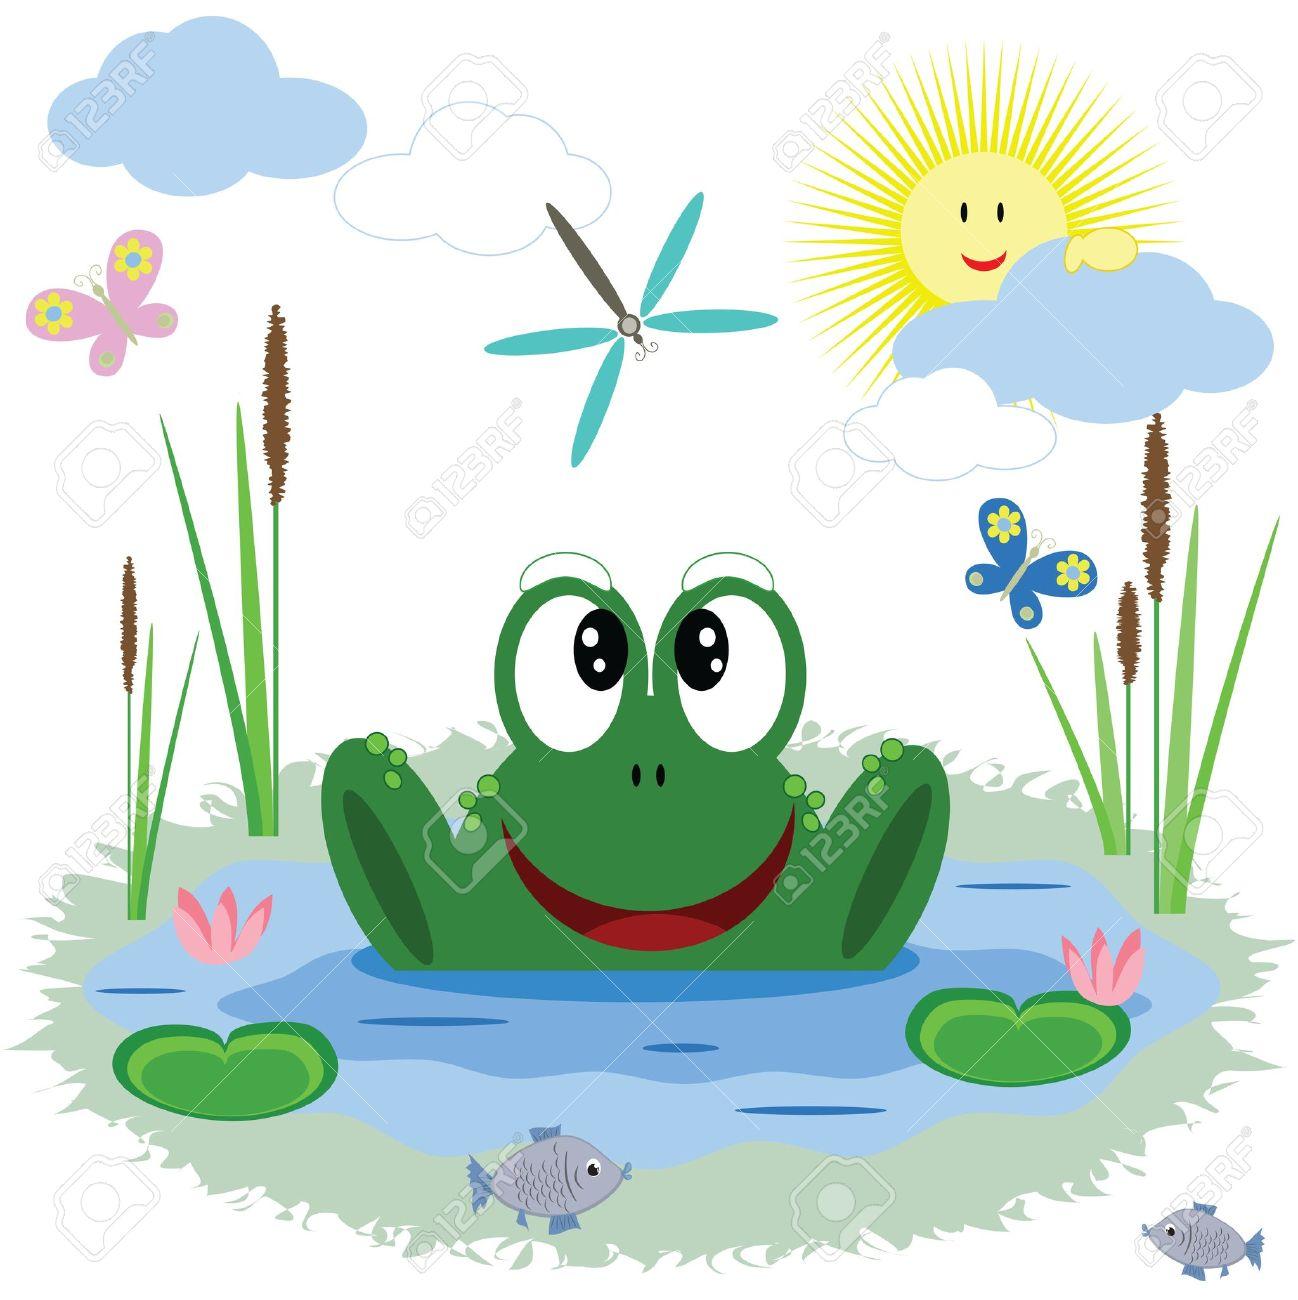 Frog pond clipart svg library stock Frog pond clipart 9 » Clipart Station svg library stock